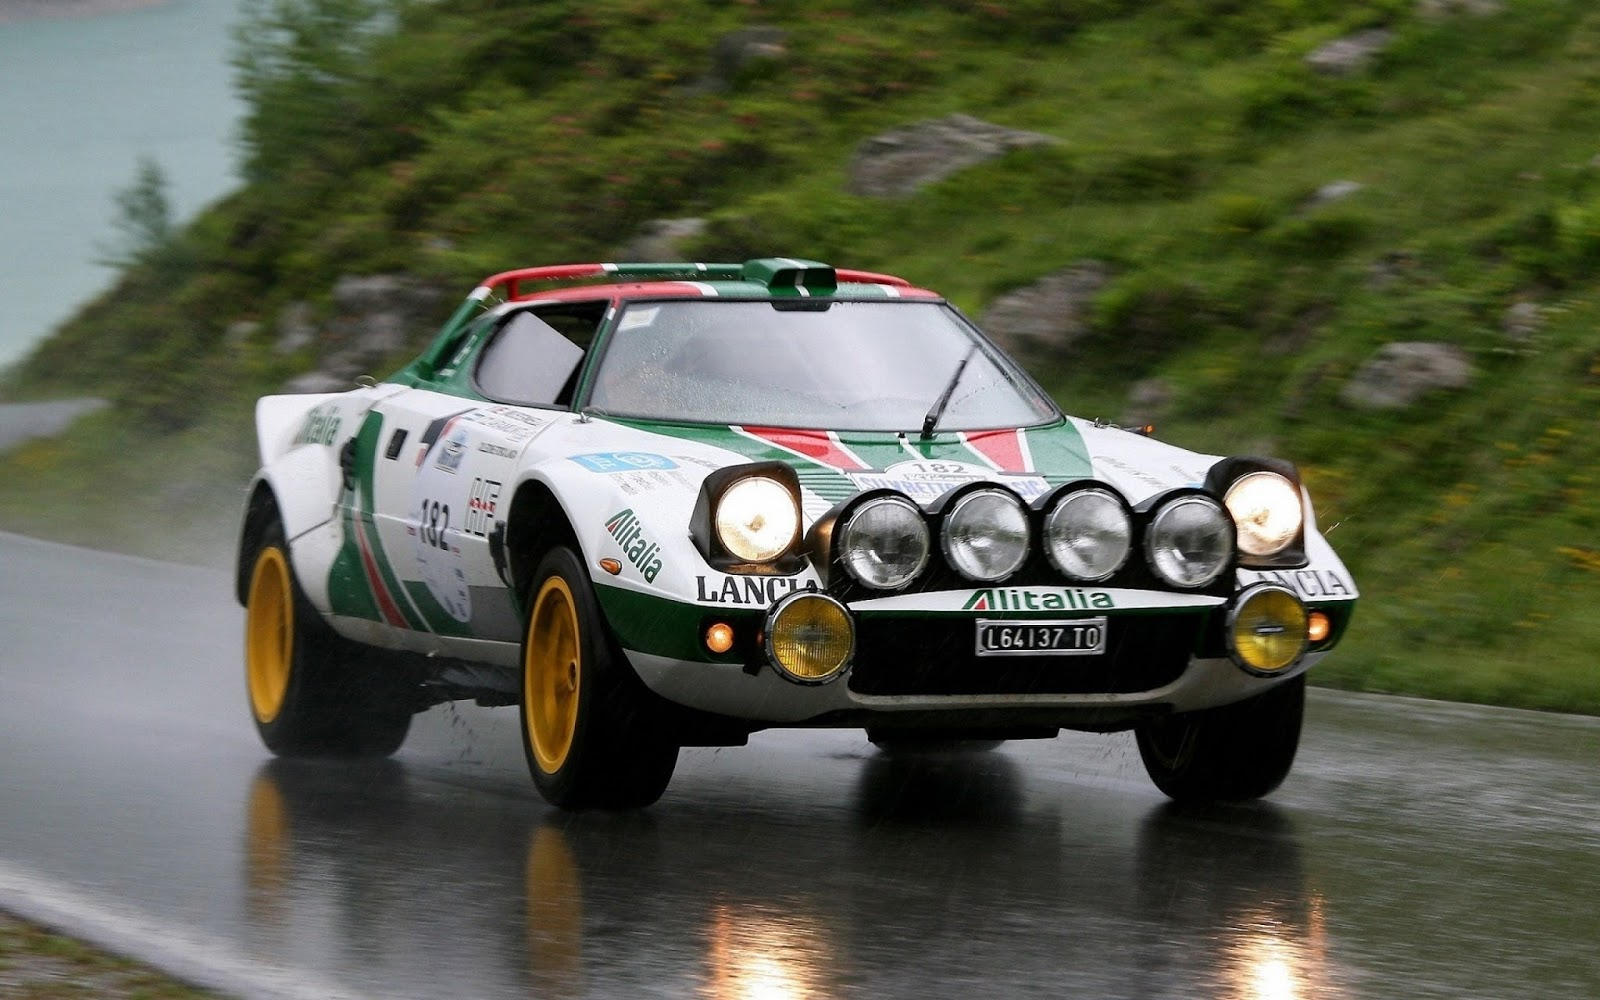 stratos Ονειρική συνάντηση με 37+1 Lancia Stratos Classic, Group B, Lancia, Laoncia Stratos, videos